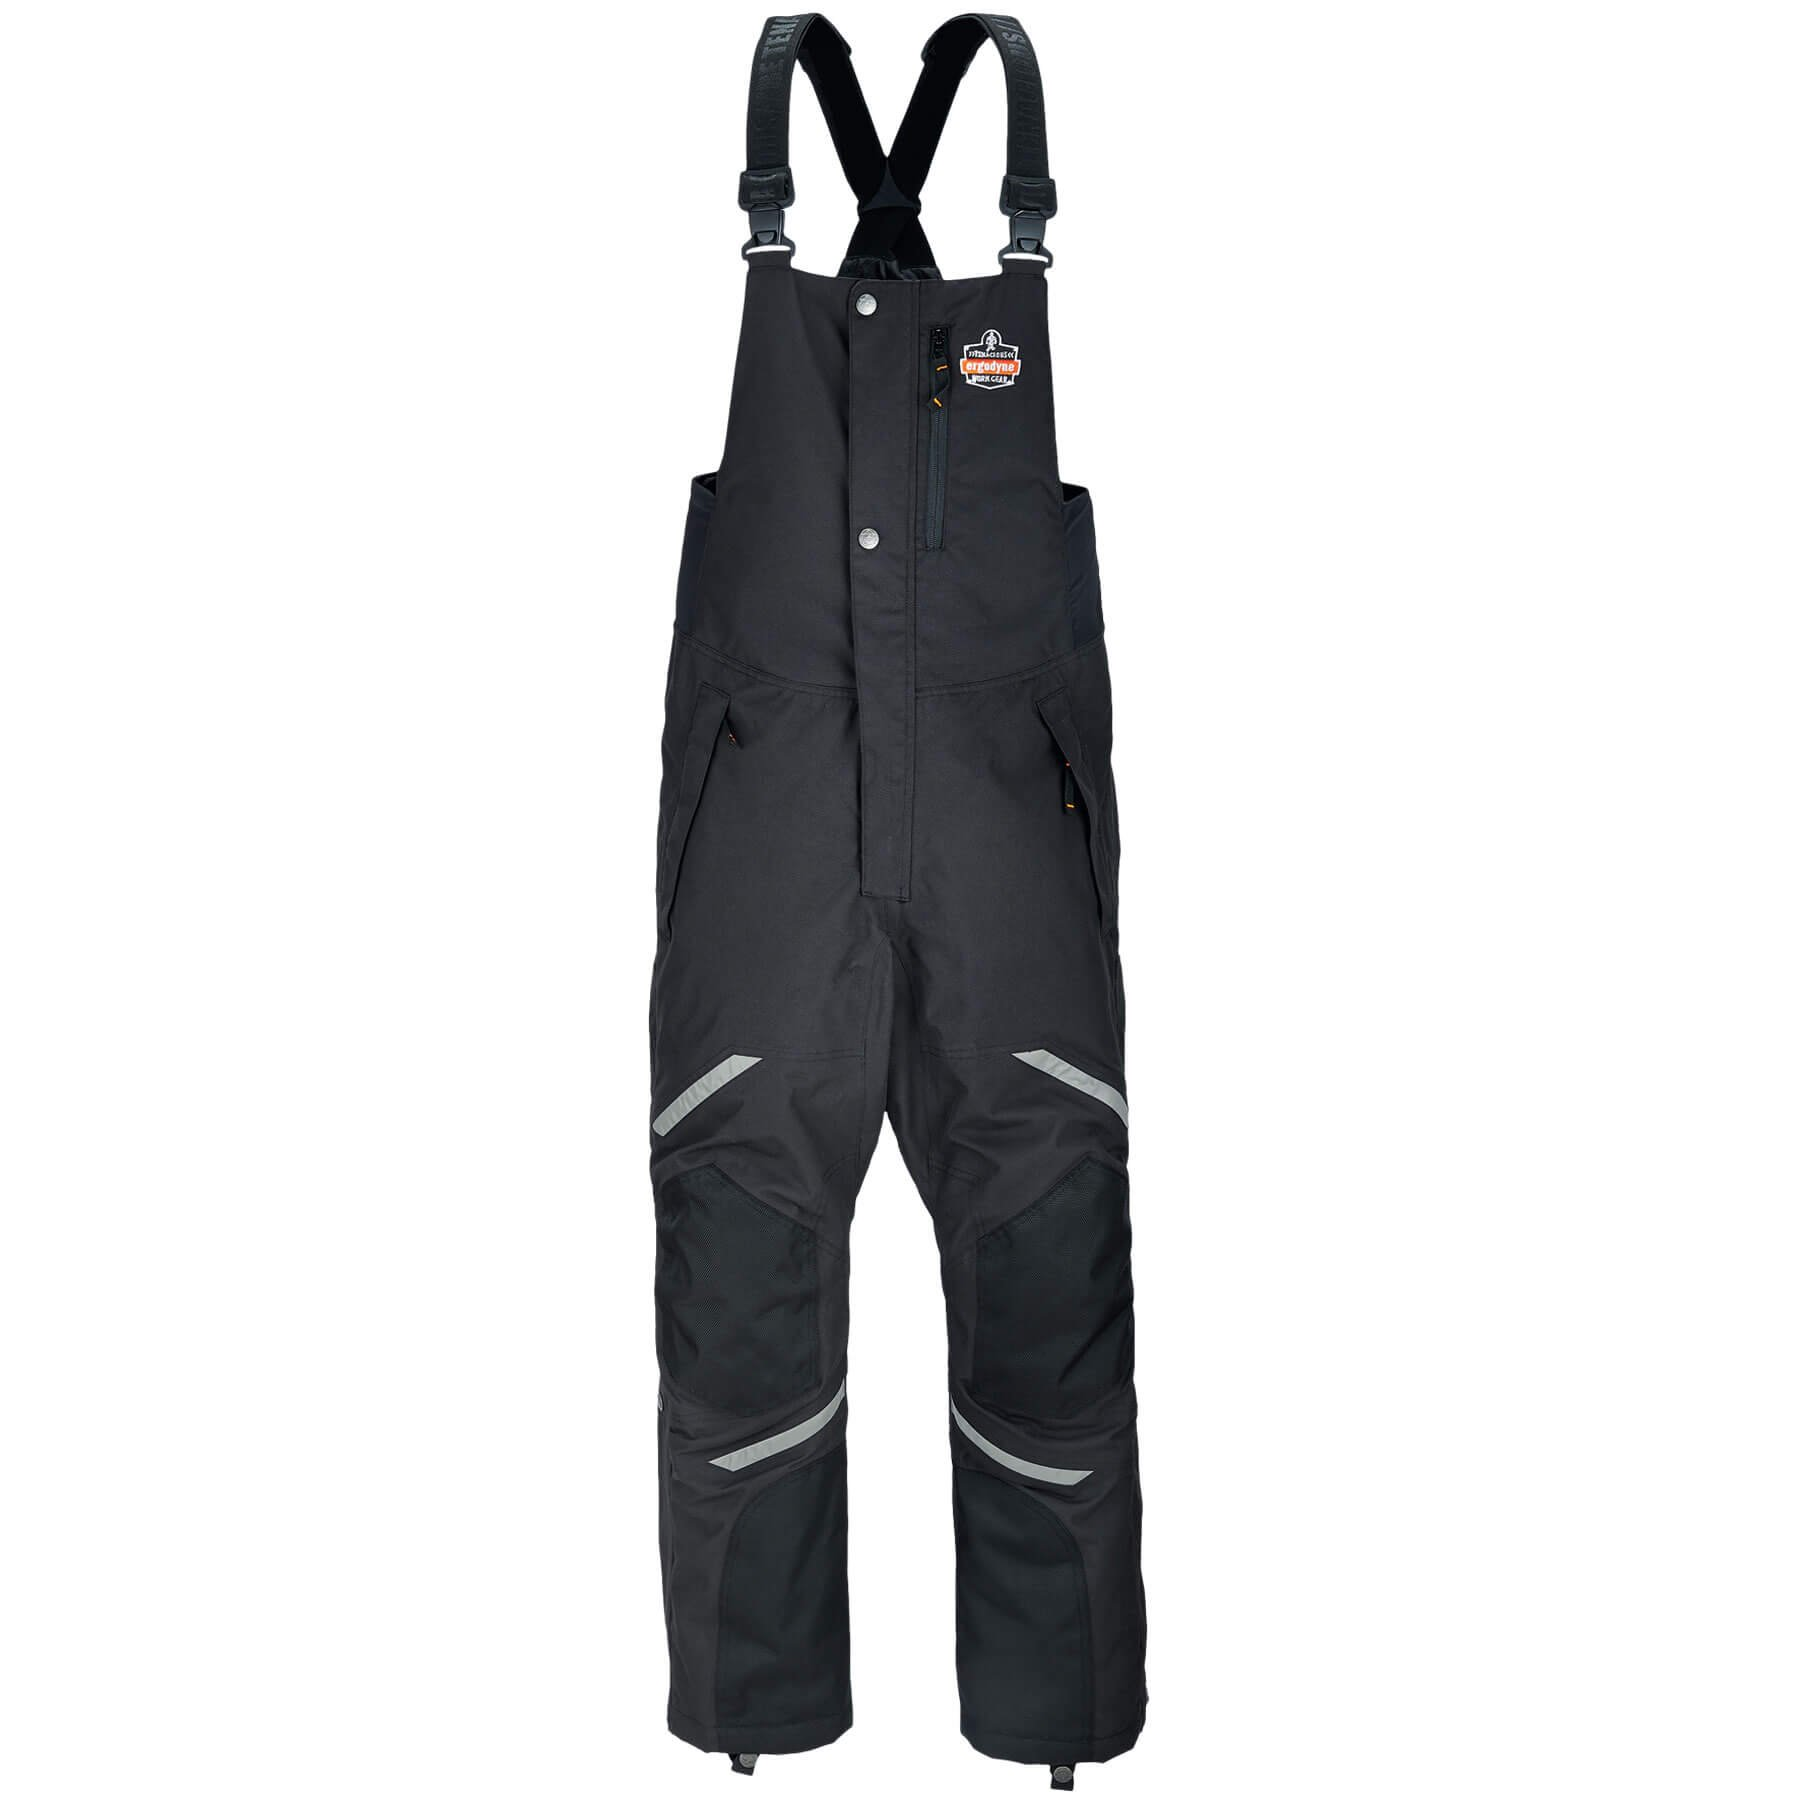 Ergodyne N-Ferno 6471 Men's Winter Thermal Work Bib Overalls, Black, Large